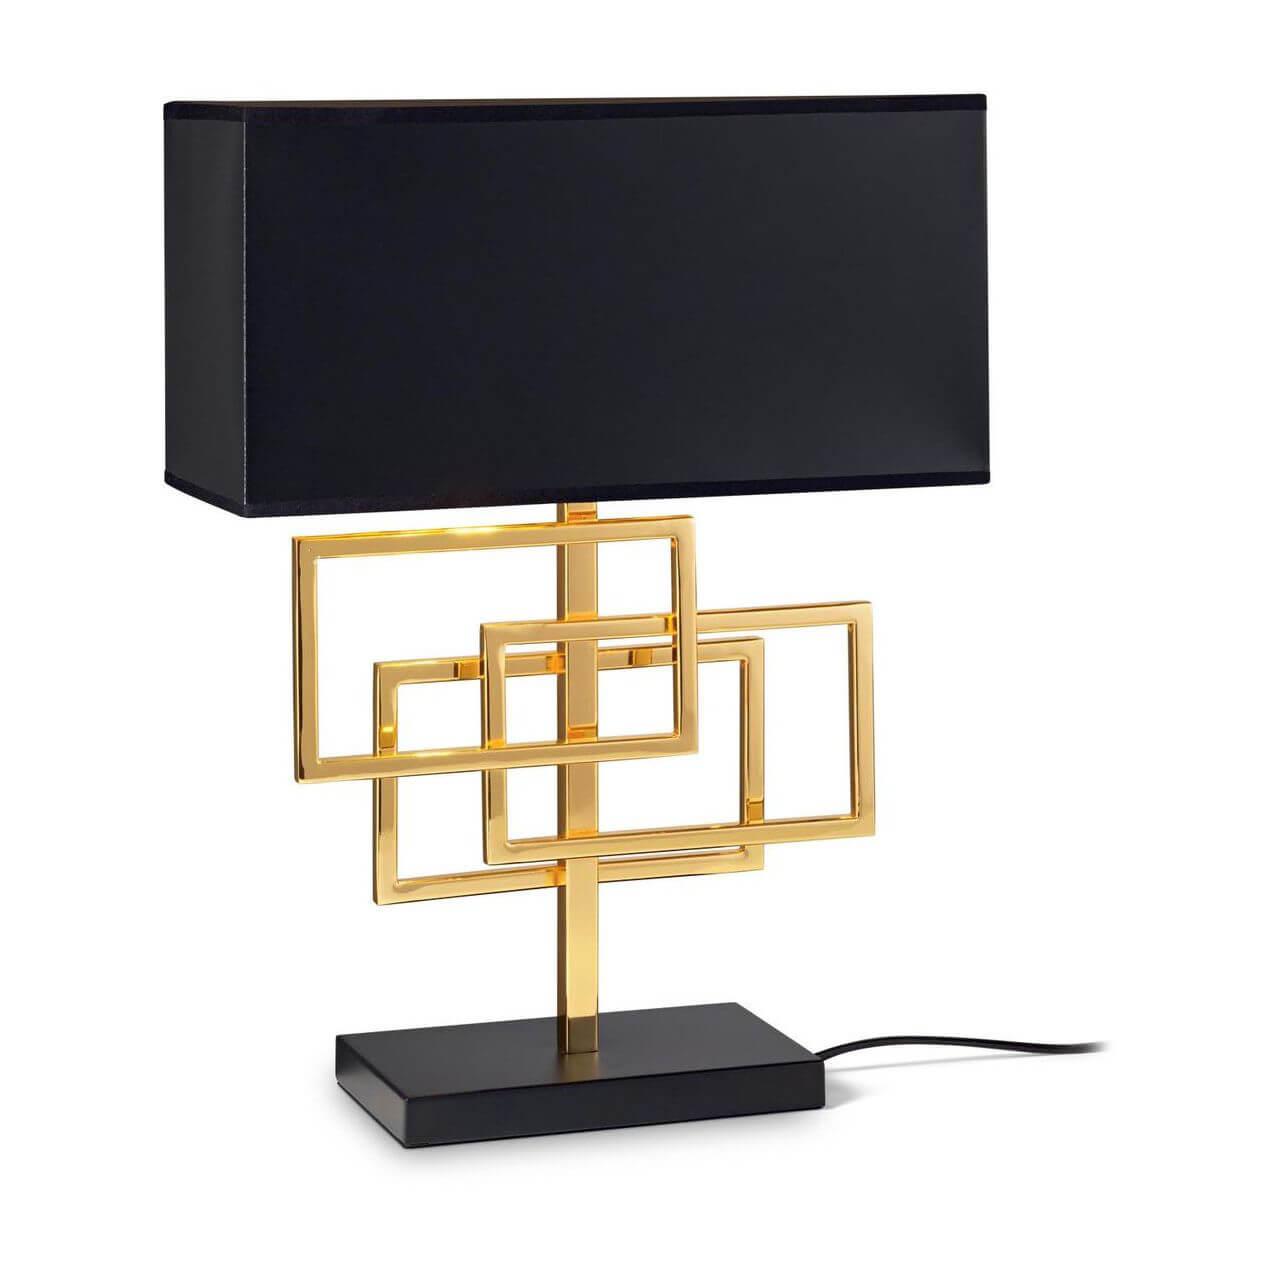 Настольная лампа Ideal Lux Luxury TL1 Ottone недорого